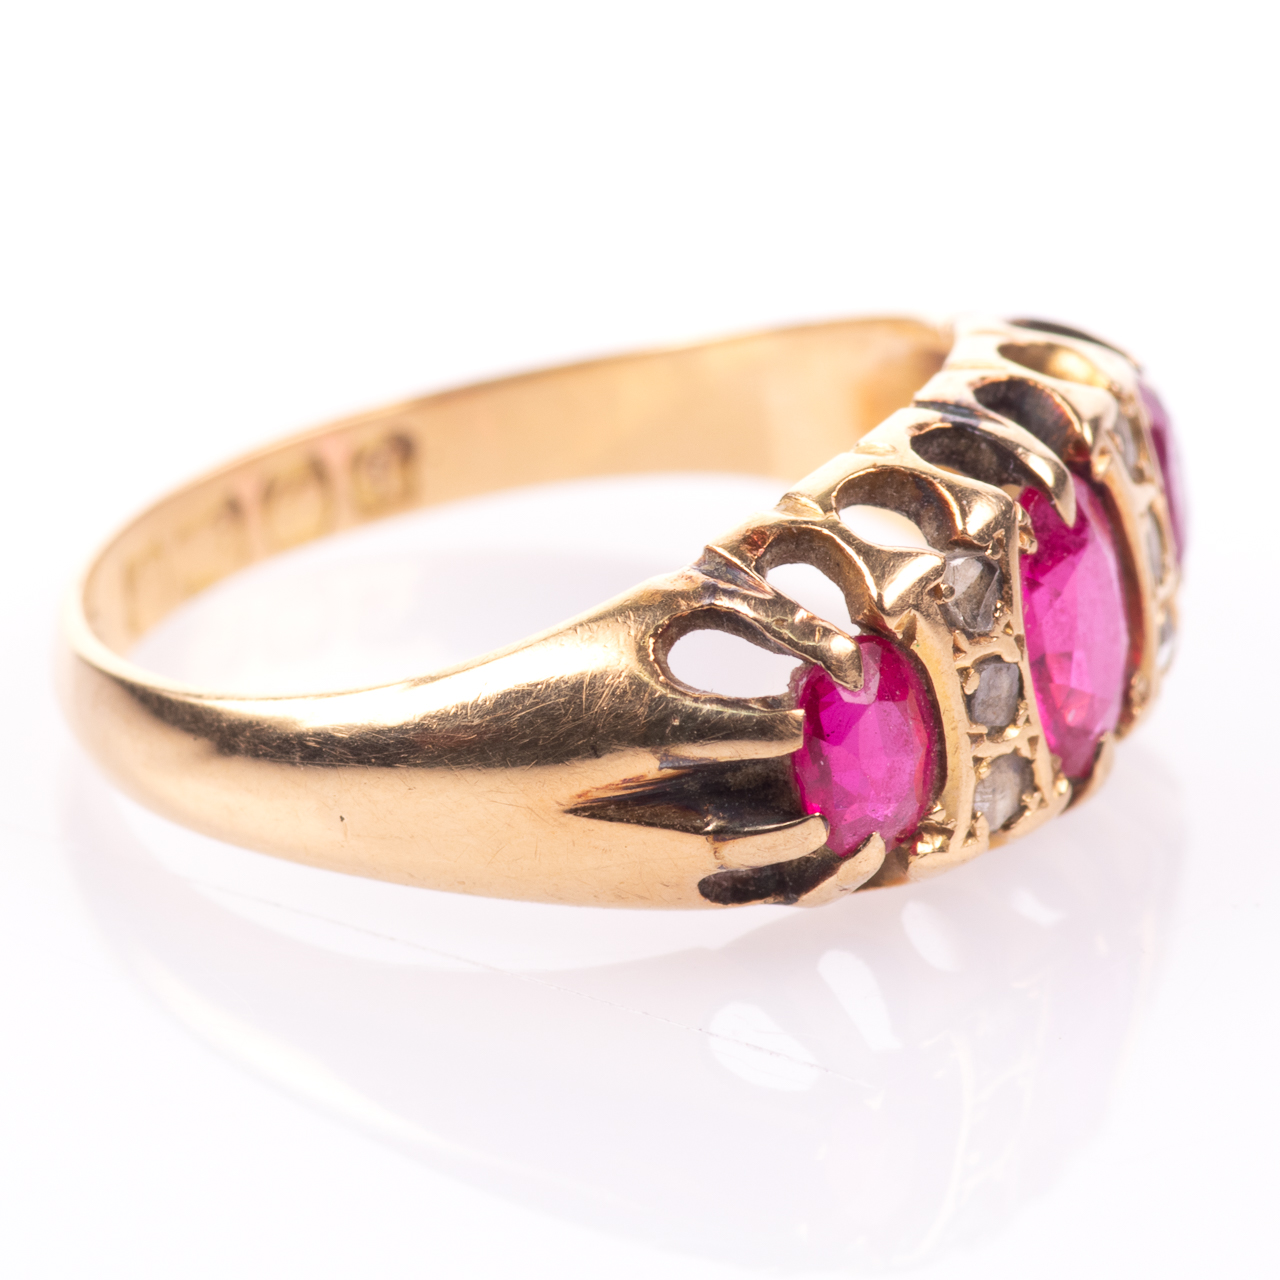 18ct Gold 1.20ct Ruby & Diamond Ring Birmingham 1915 - Image 7 of 7